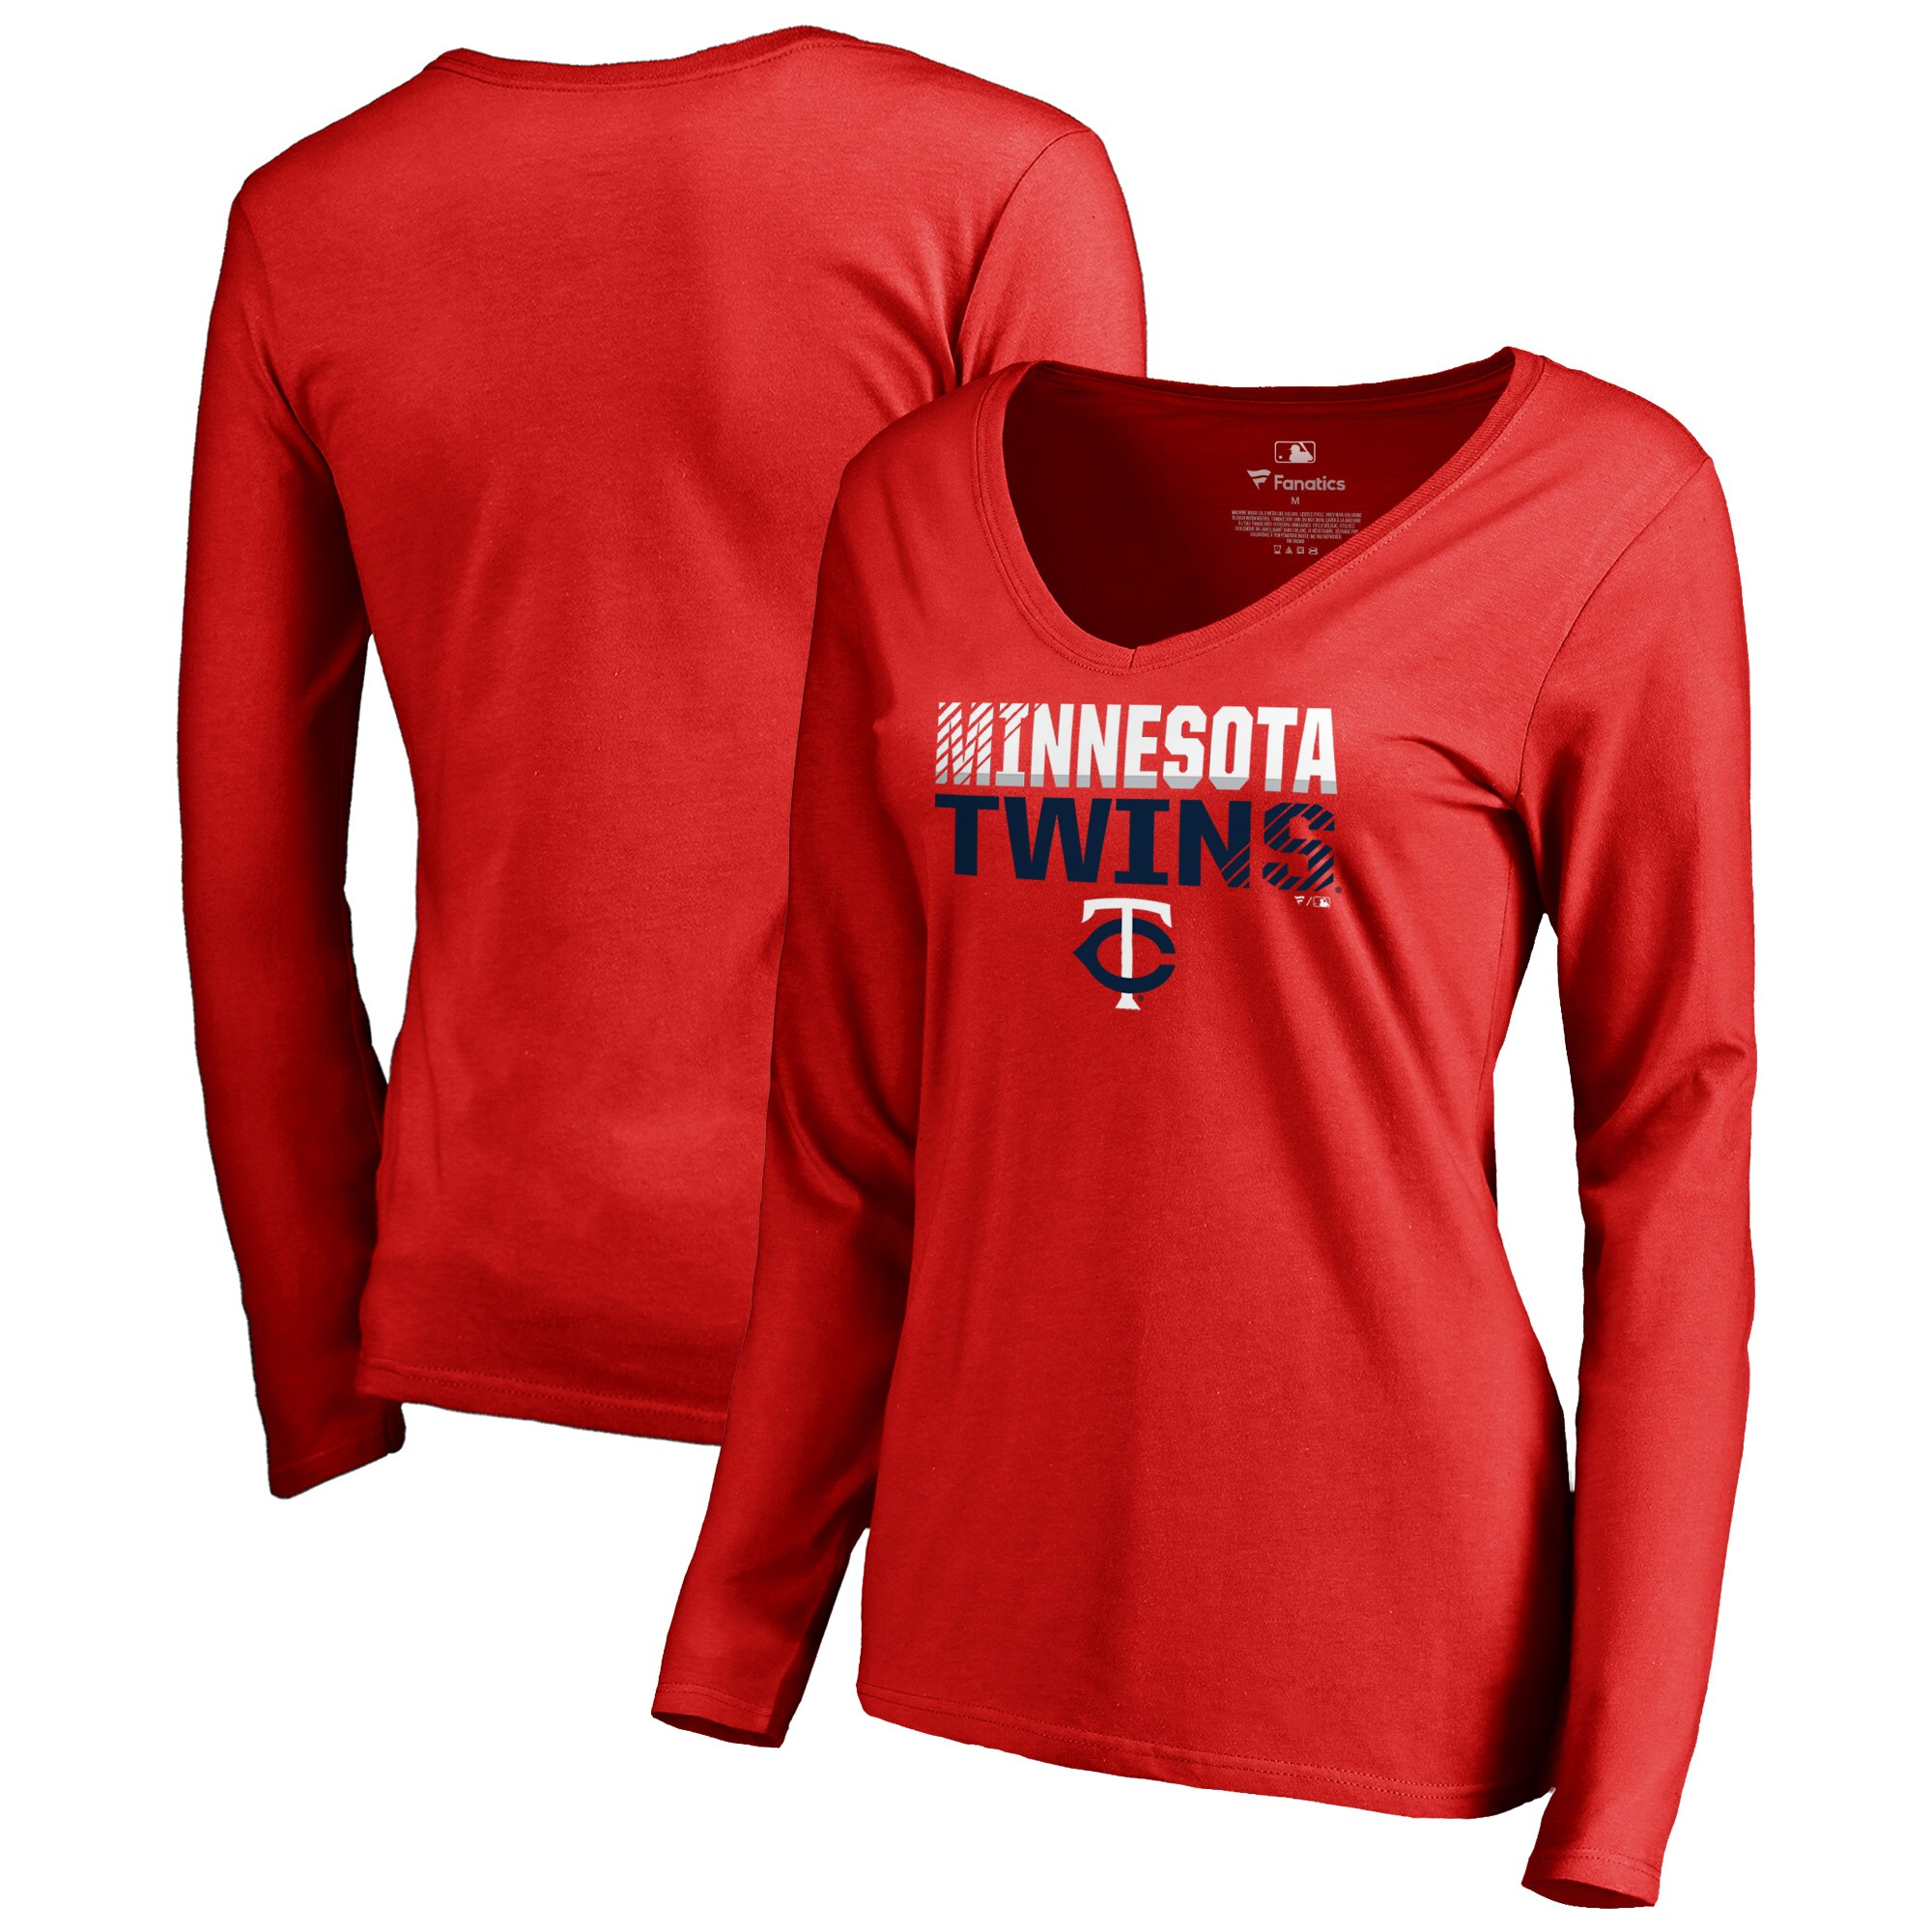 Minnesota Twins Fanatics Branded Women's Fade Out V-Neck Long Sleeve T-Shirt - Red